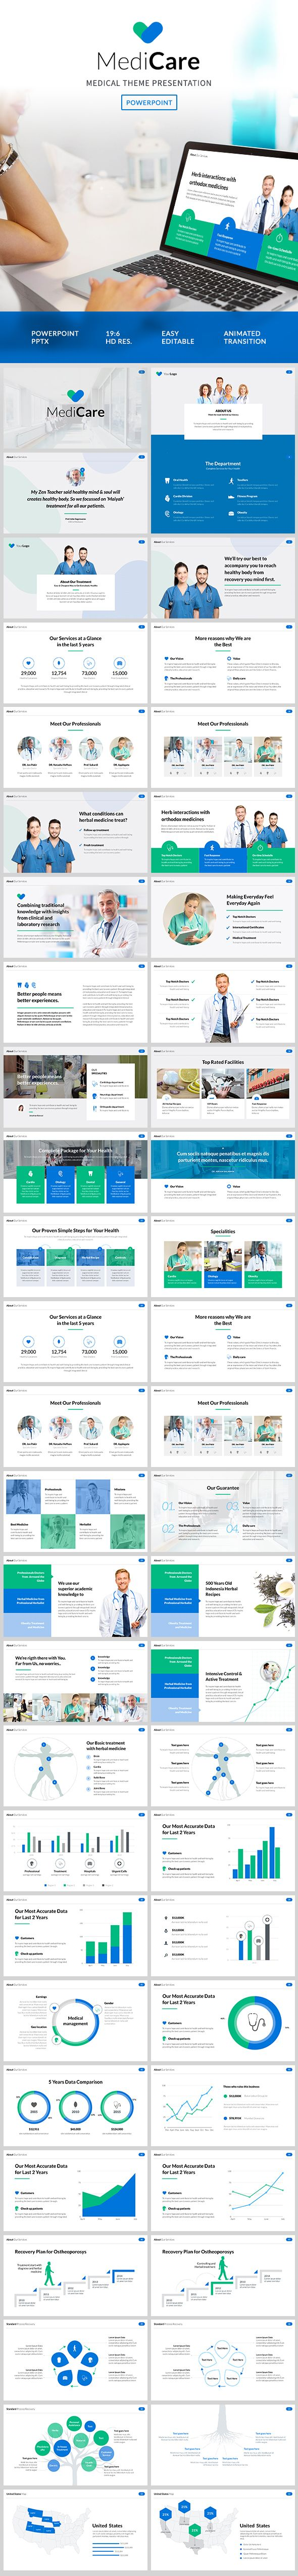 Medicare medical theme powerpoint template medical template and medicare medical theme powerpoint template medical template and presentation templates toneelgroepblik Images